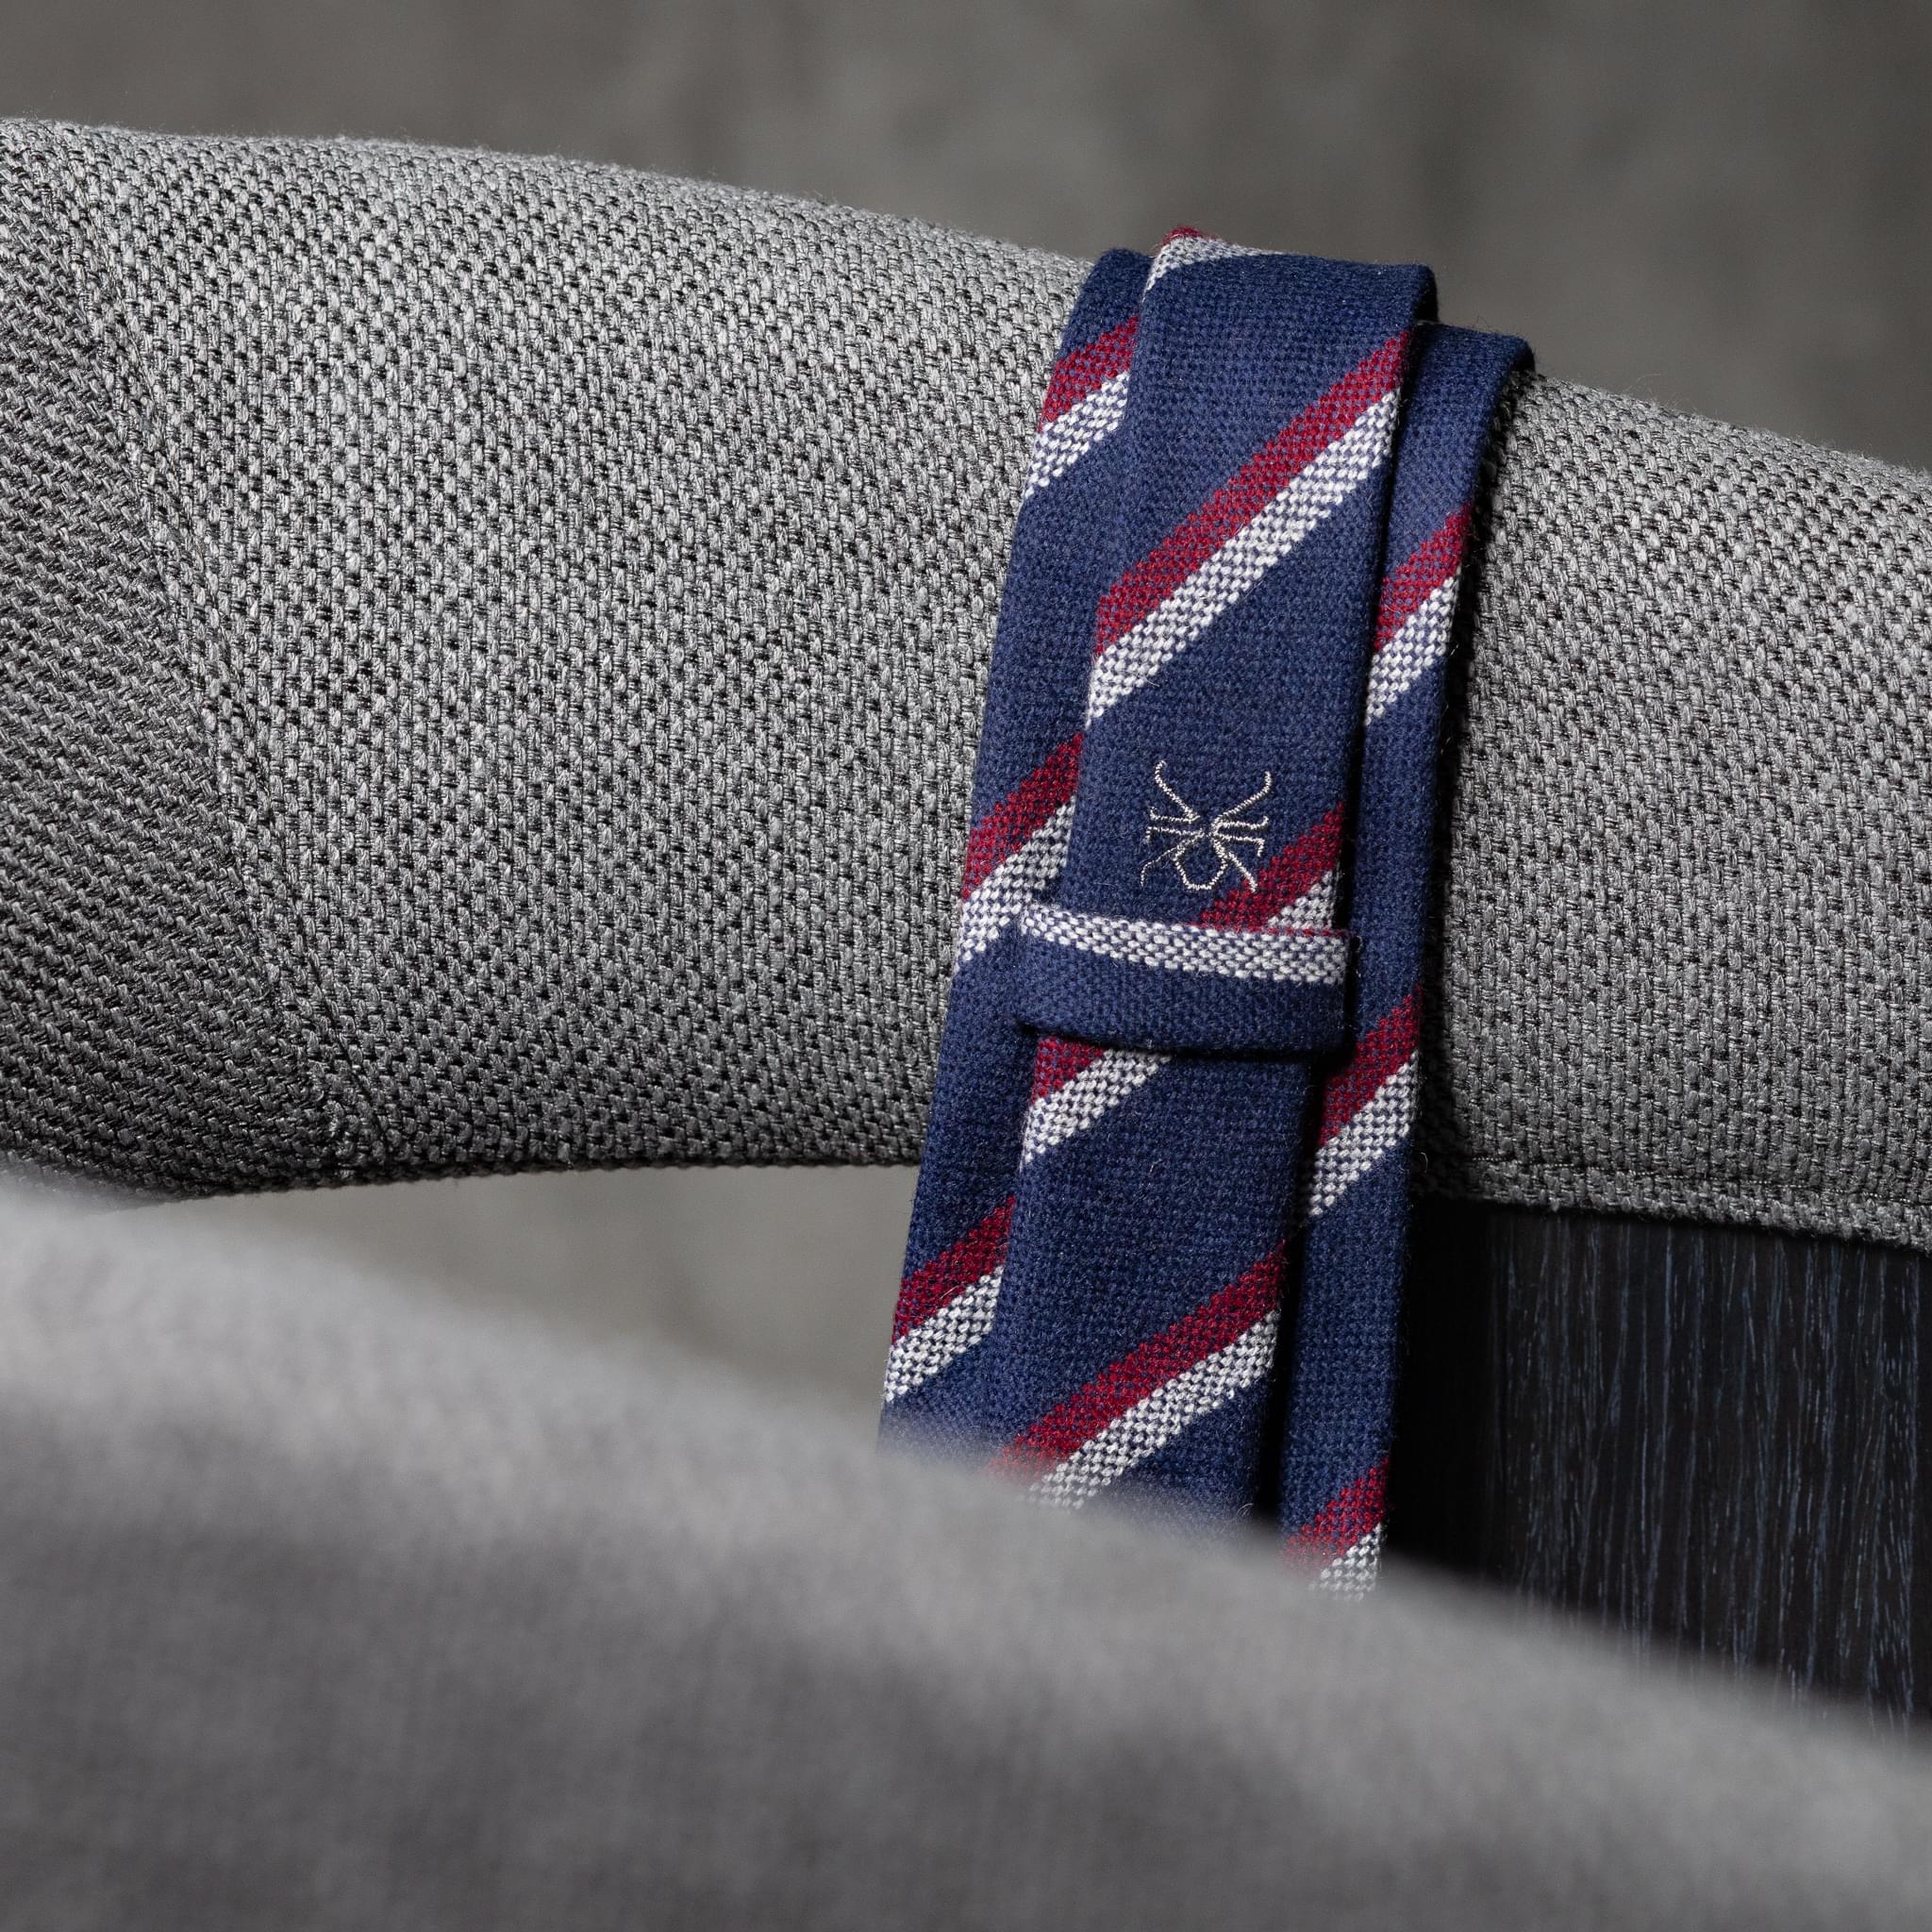 WOOL-LANA-0519-Tie-Initials-Corbata-Iniciales-The-Seelk-3